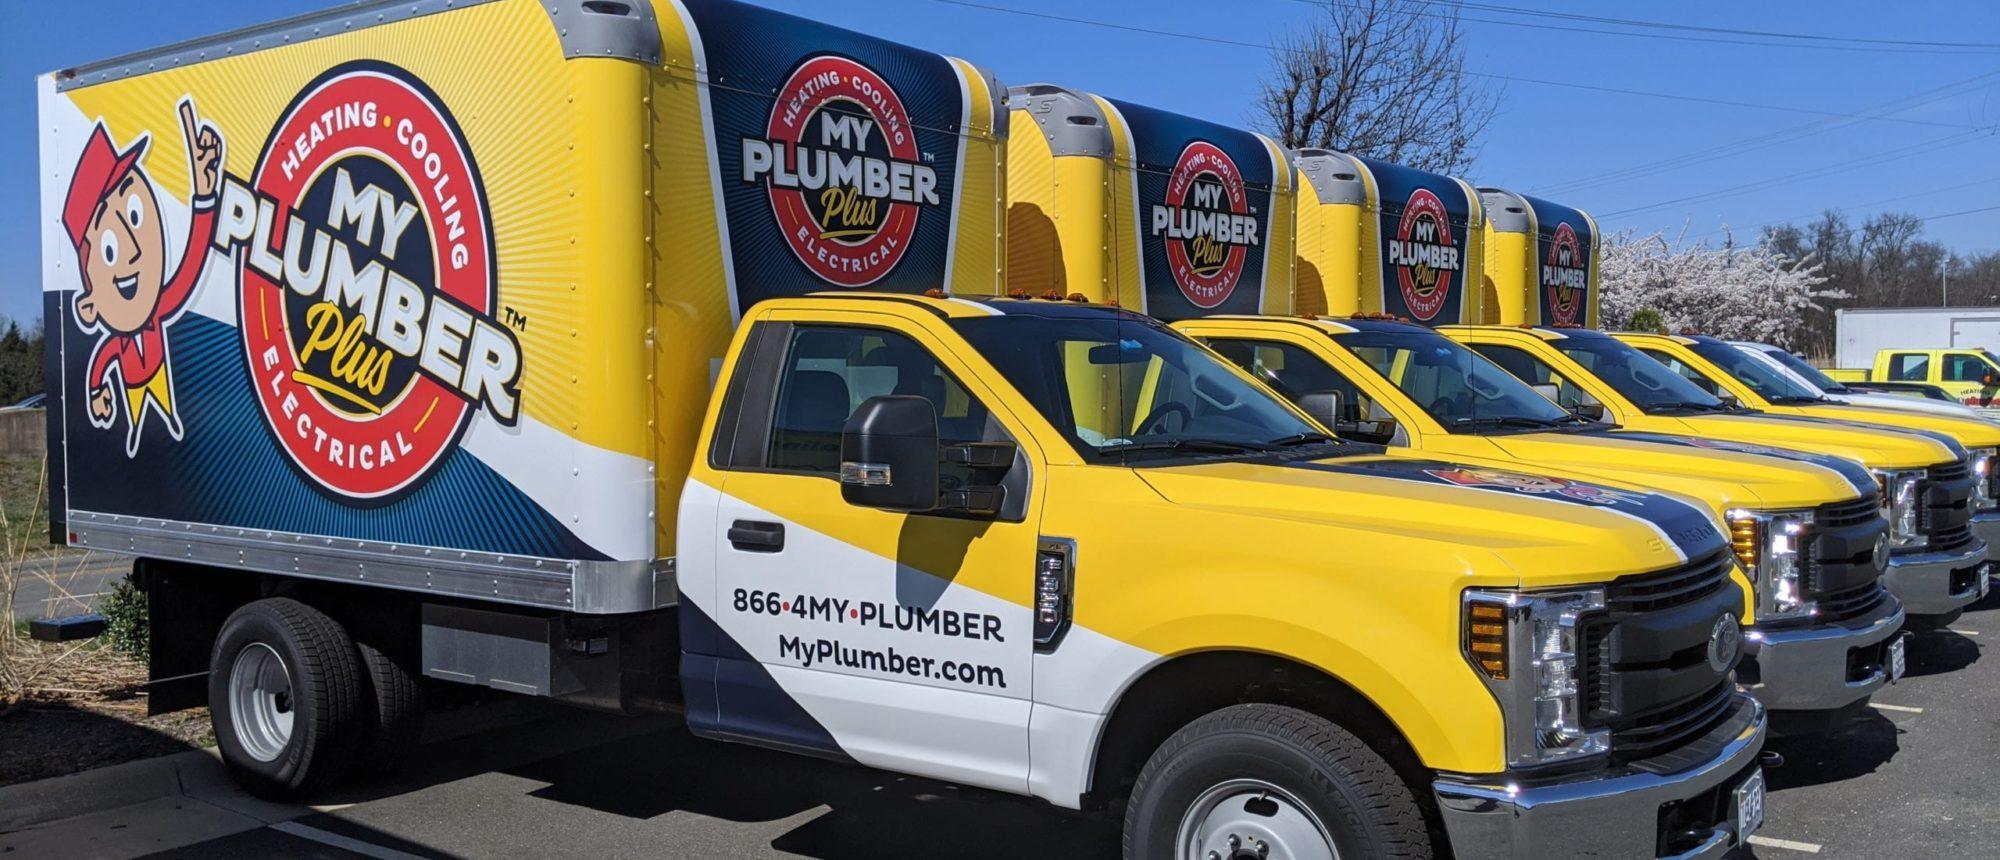 My Plumber Trucks